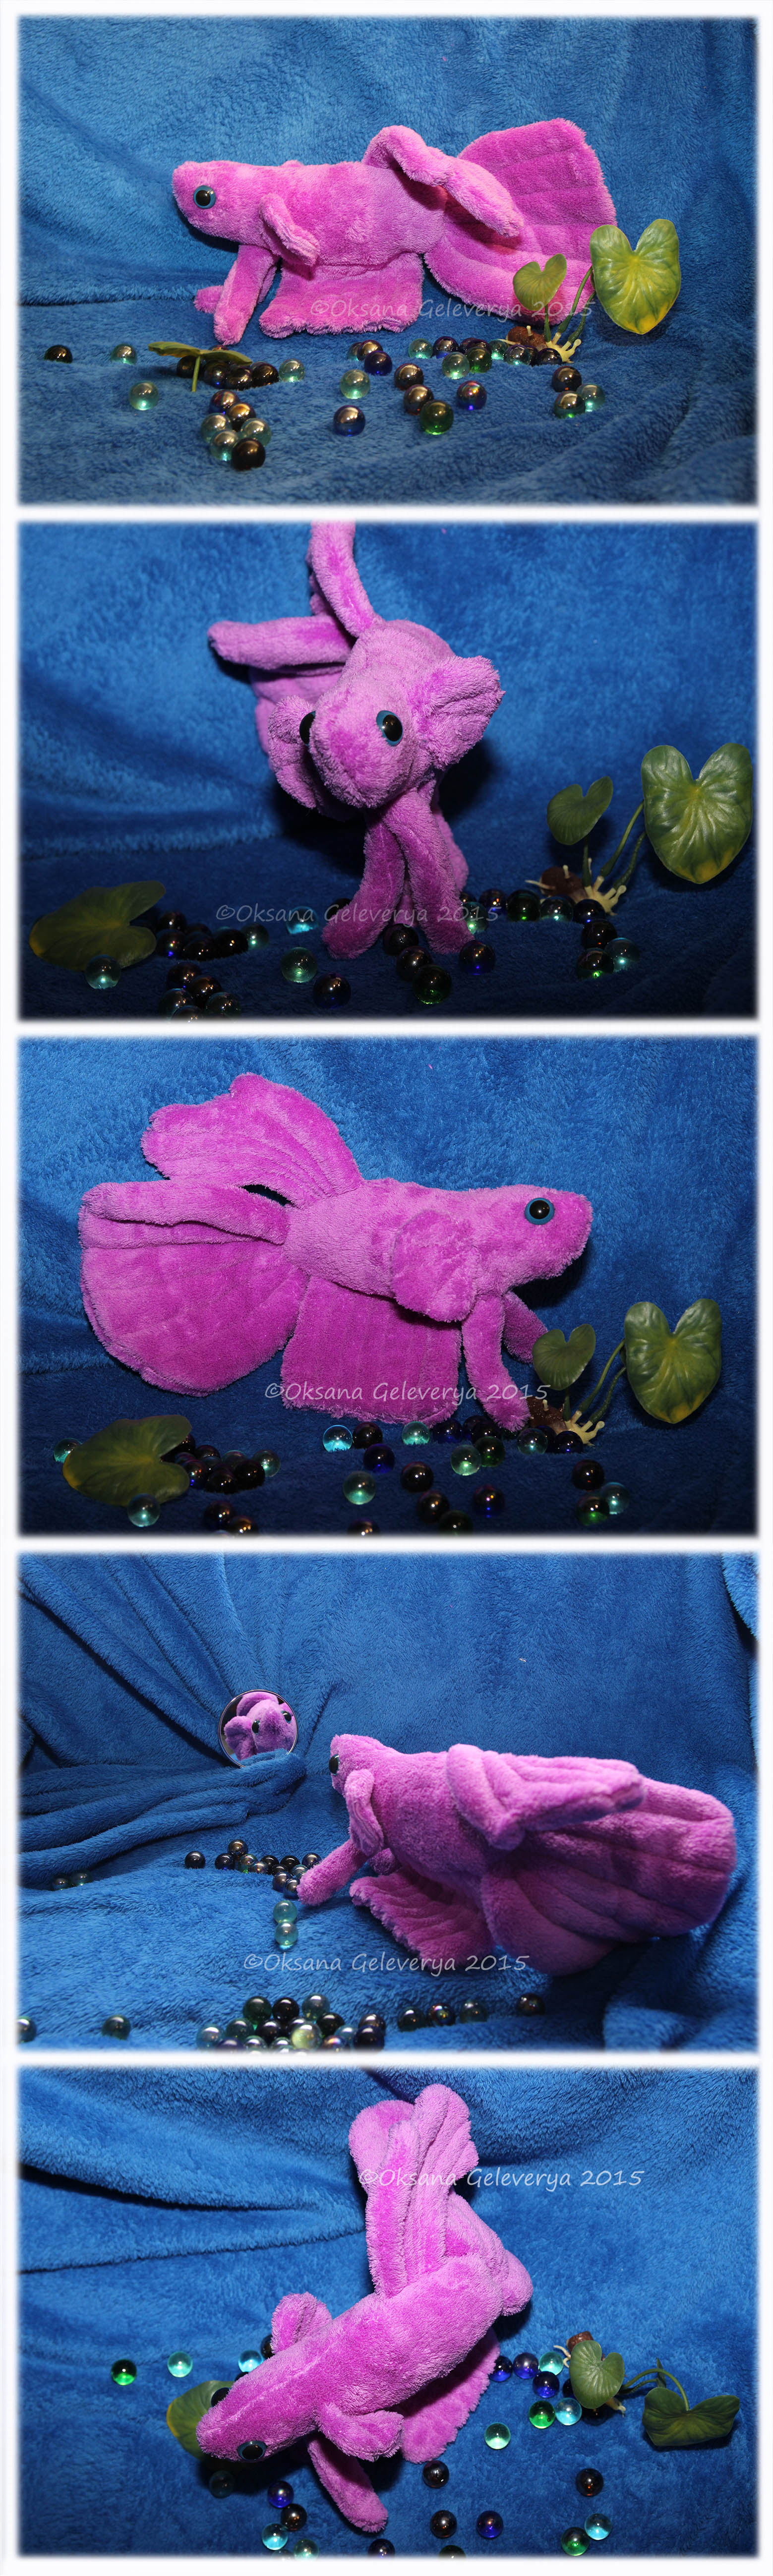 Betta fish plush pet by oksana007 on deviantart for Toys for betta fish